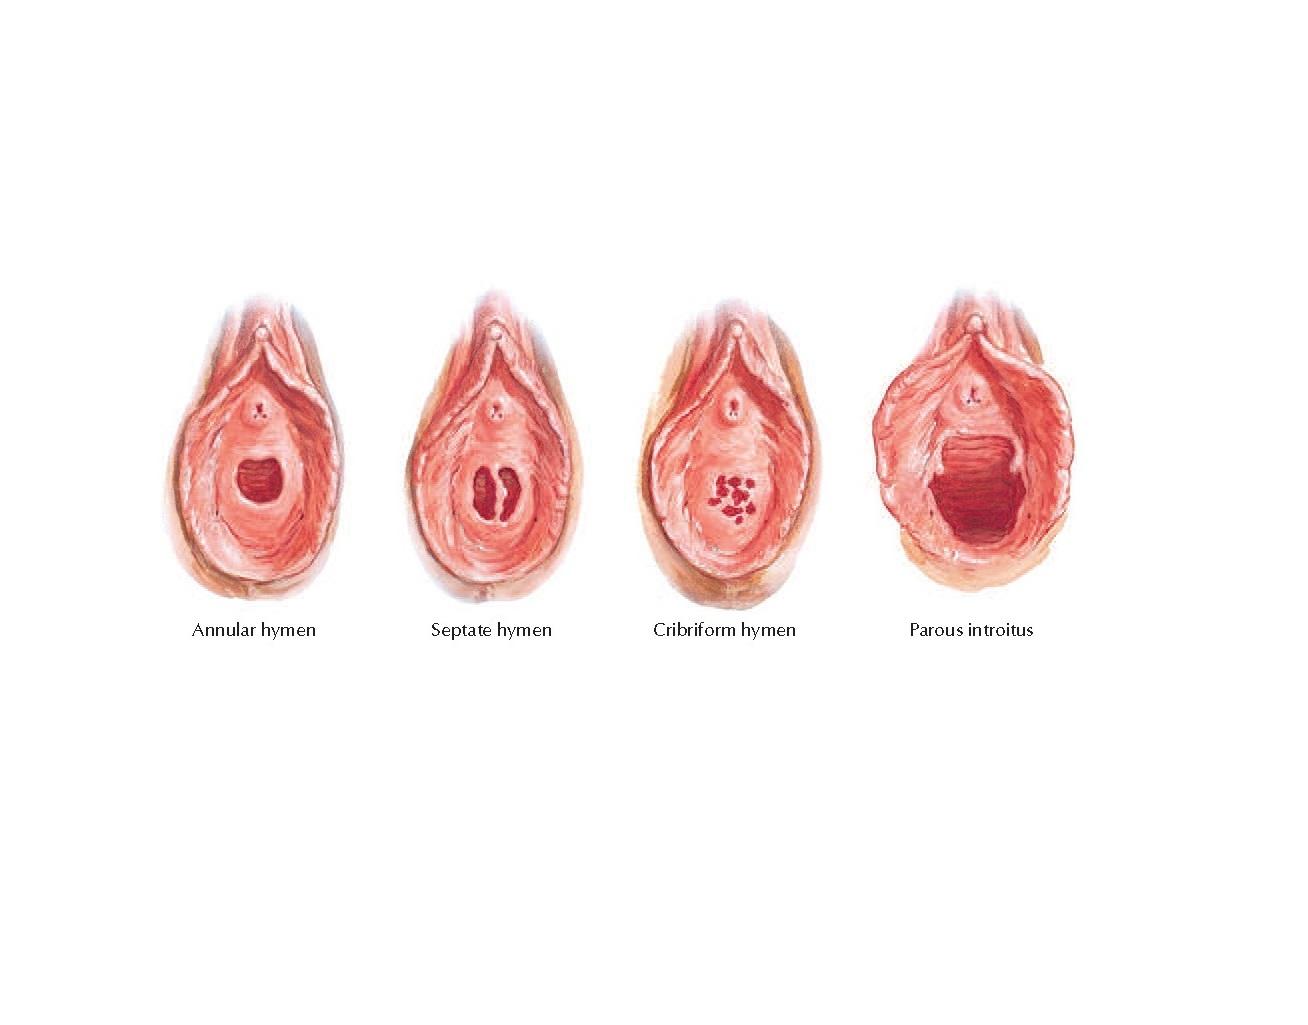 Variations in Hymen Anatomy